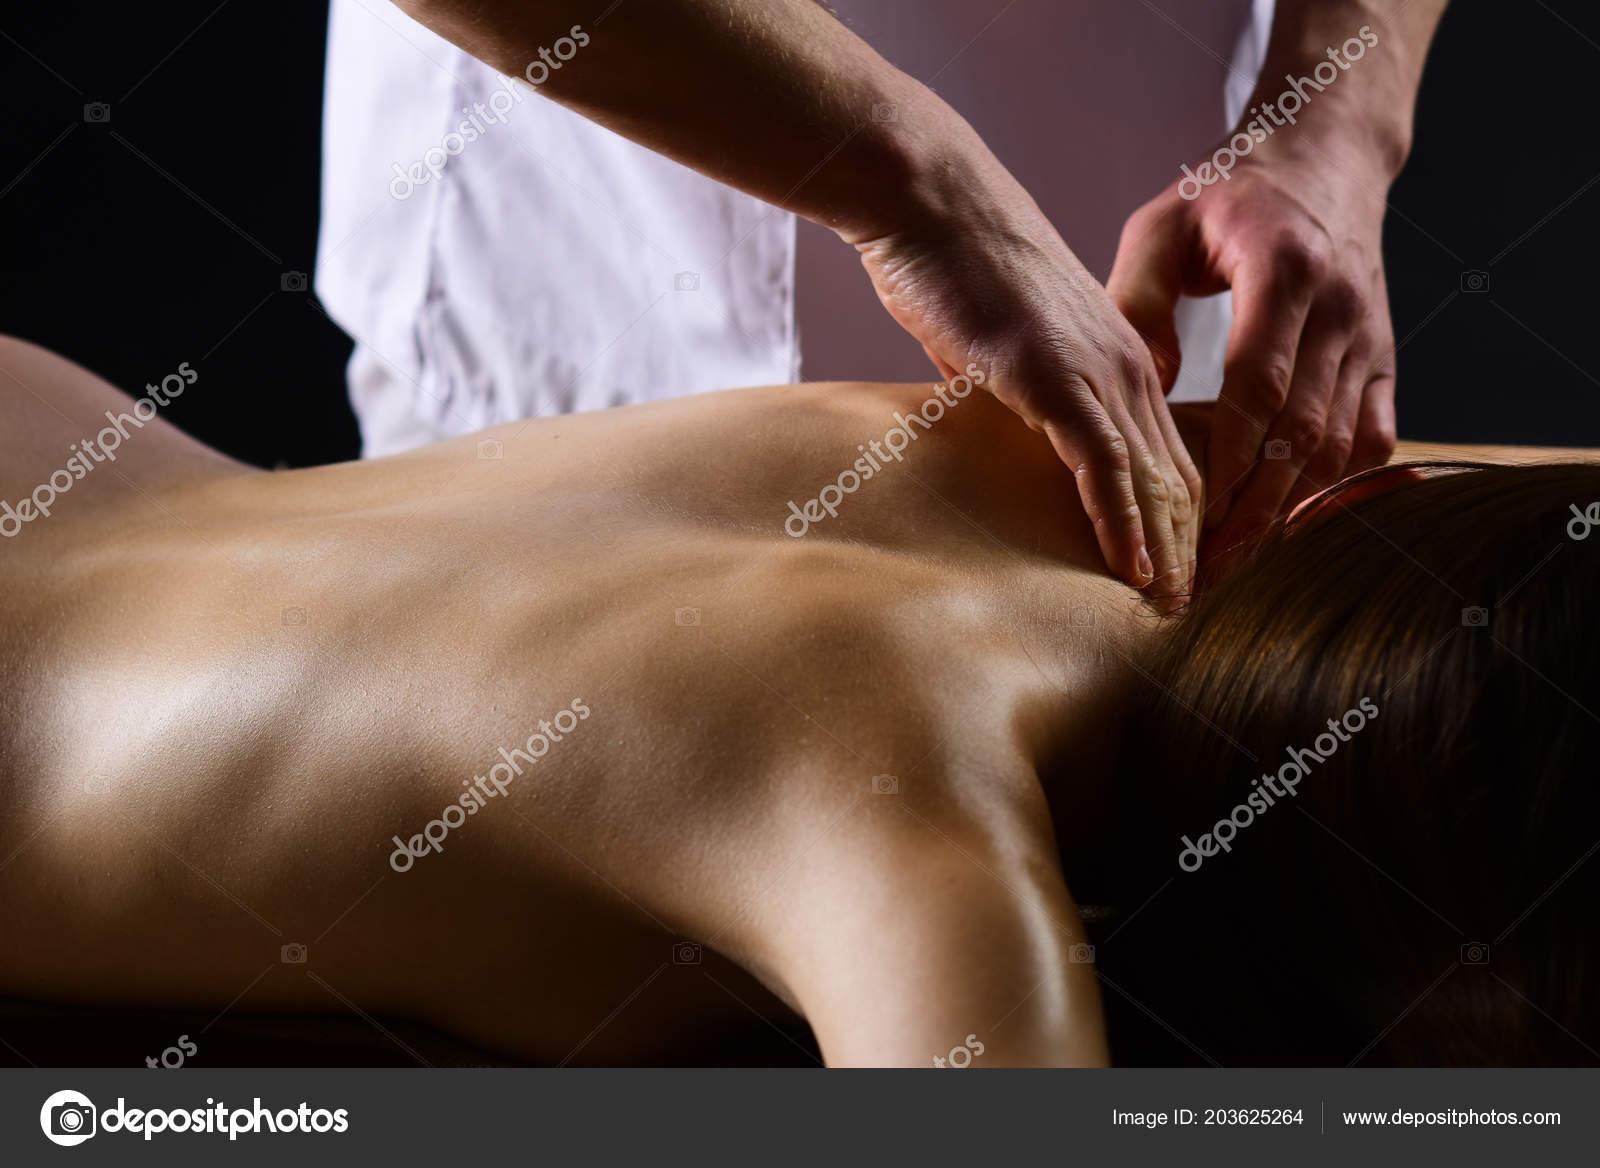 Nacked women body massage